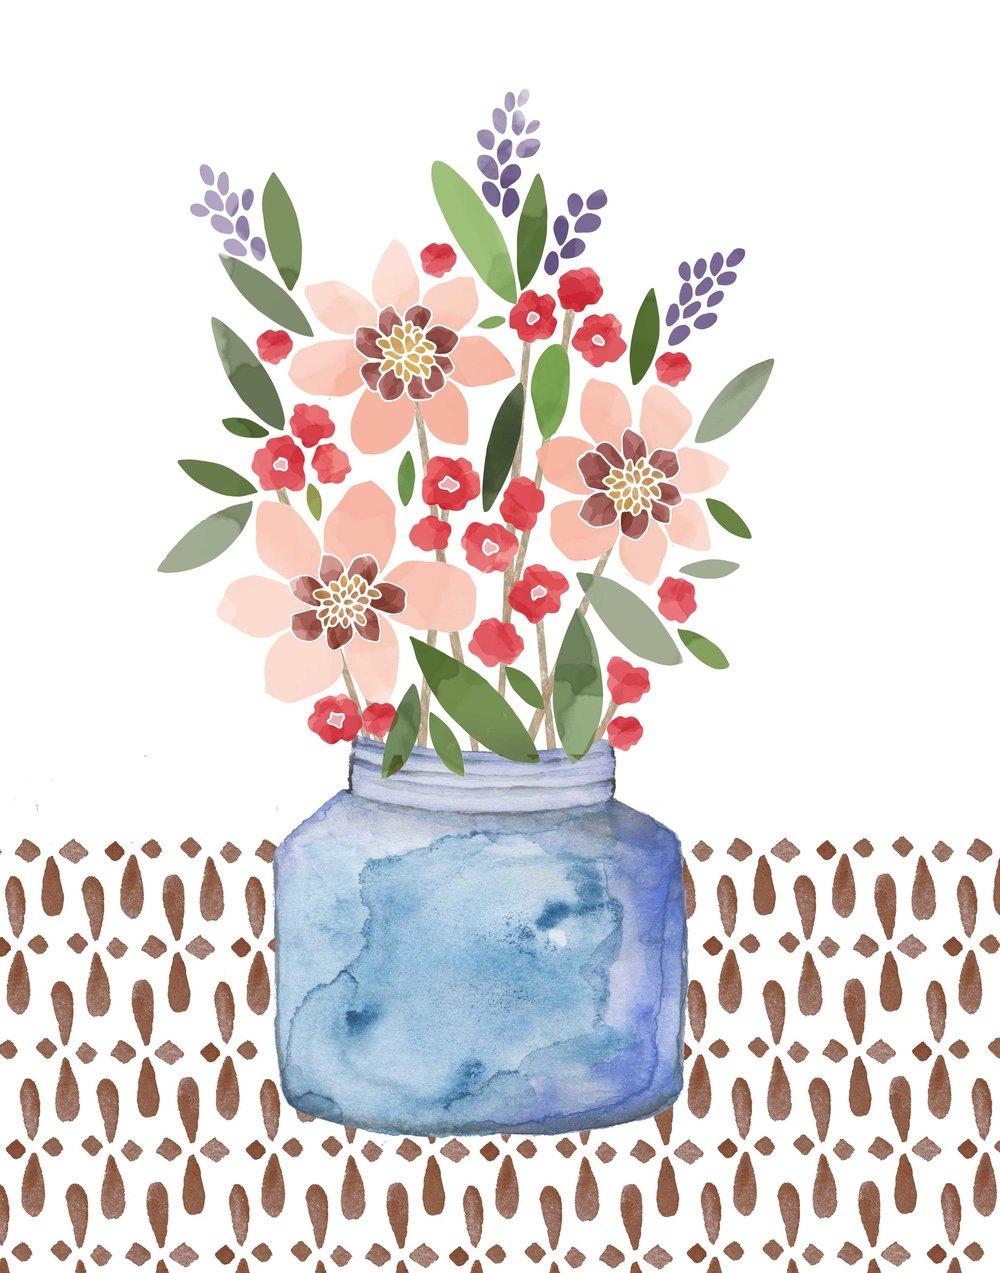 Elizatodd flowers in glass vase